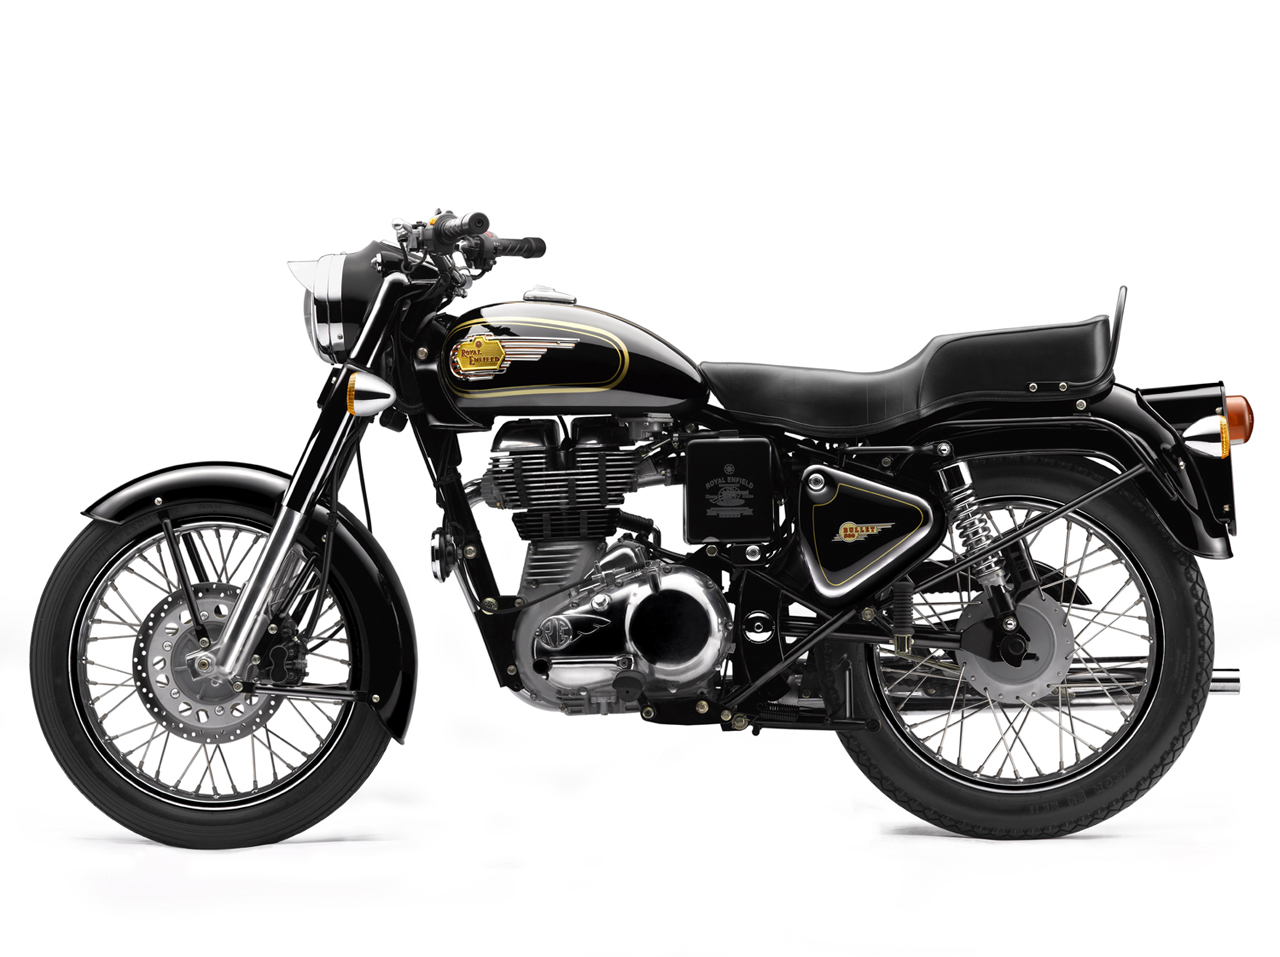 online wallpapers shop royal enfield bullet motorcycle pictures. Black Bedroom Furniture Sets. Home Design Ideas